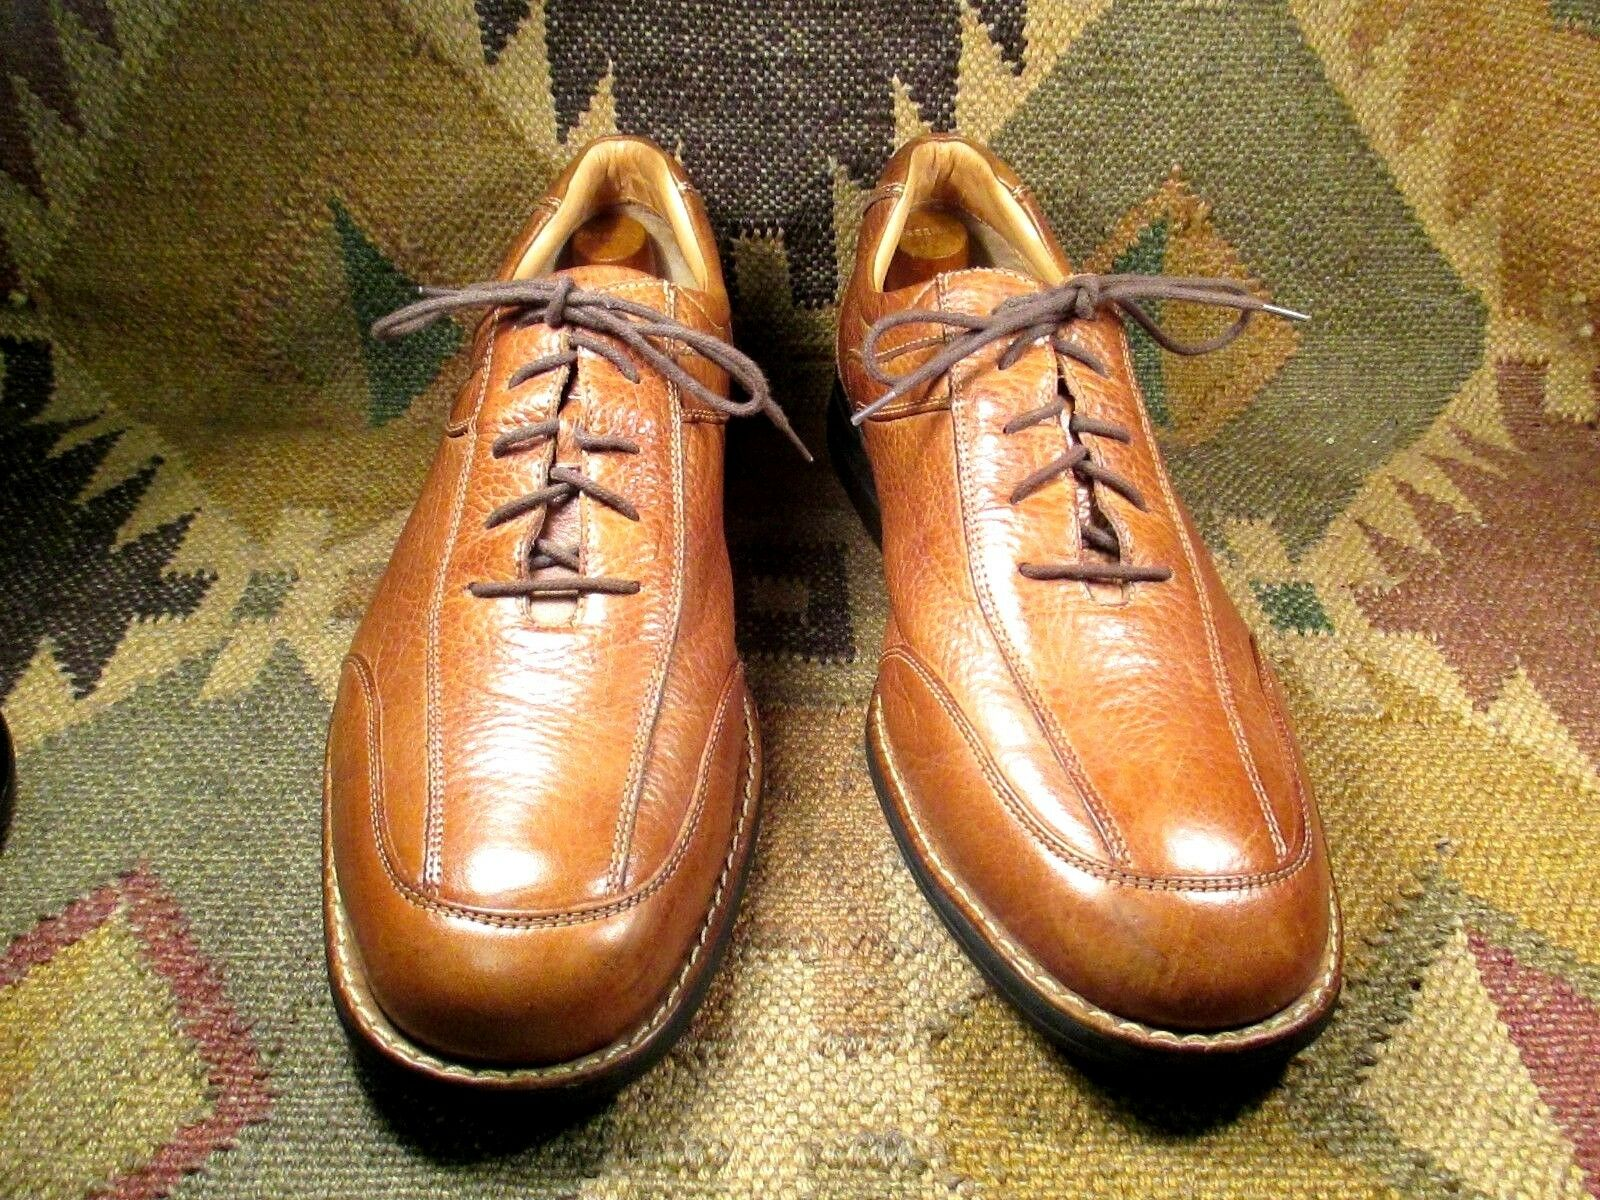 Johnston Murphy Sheepskin Brown Pelle Oxfords All weather soles size USA -13 M